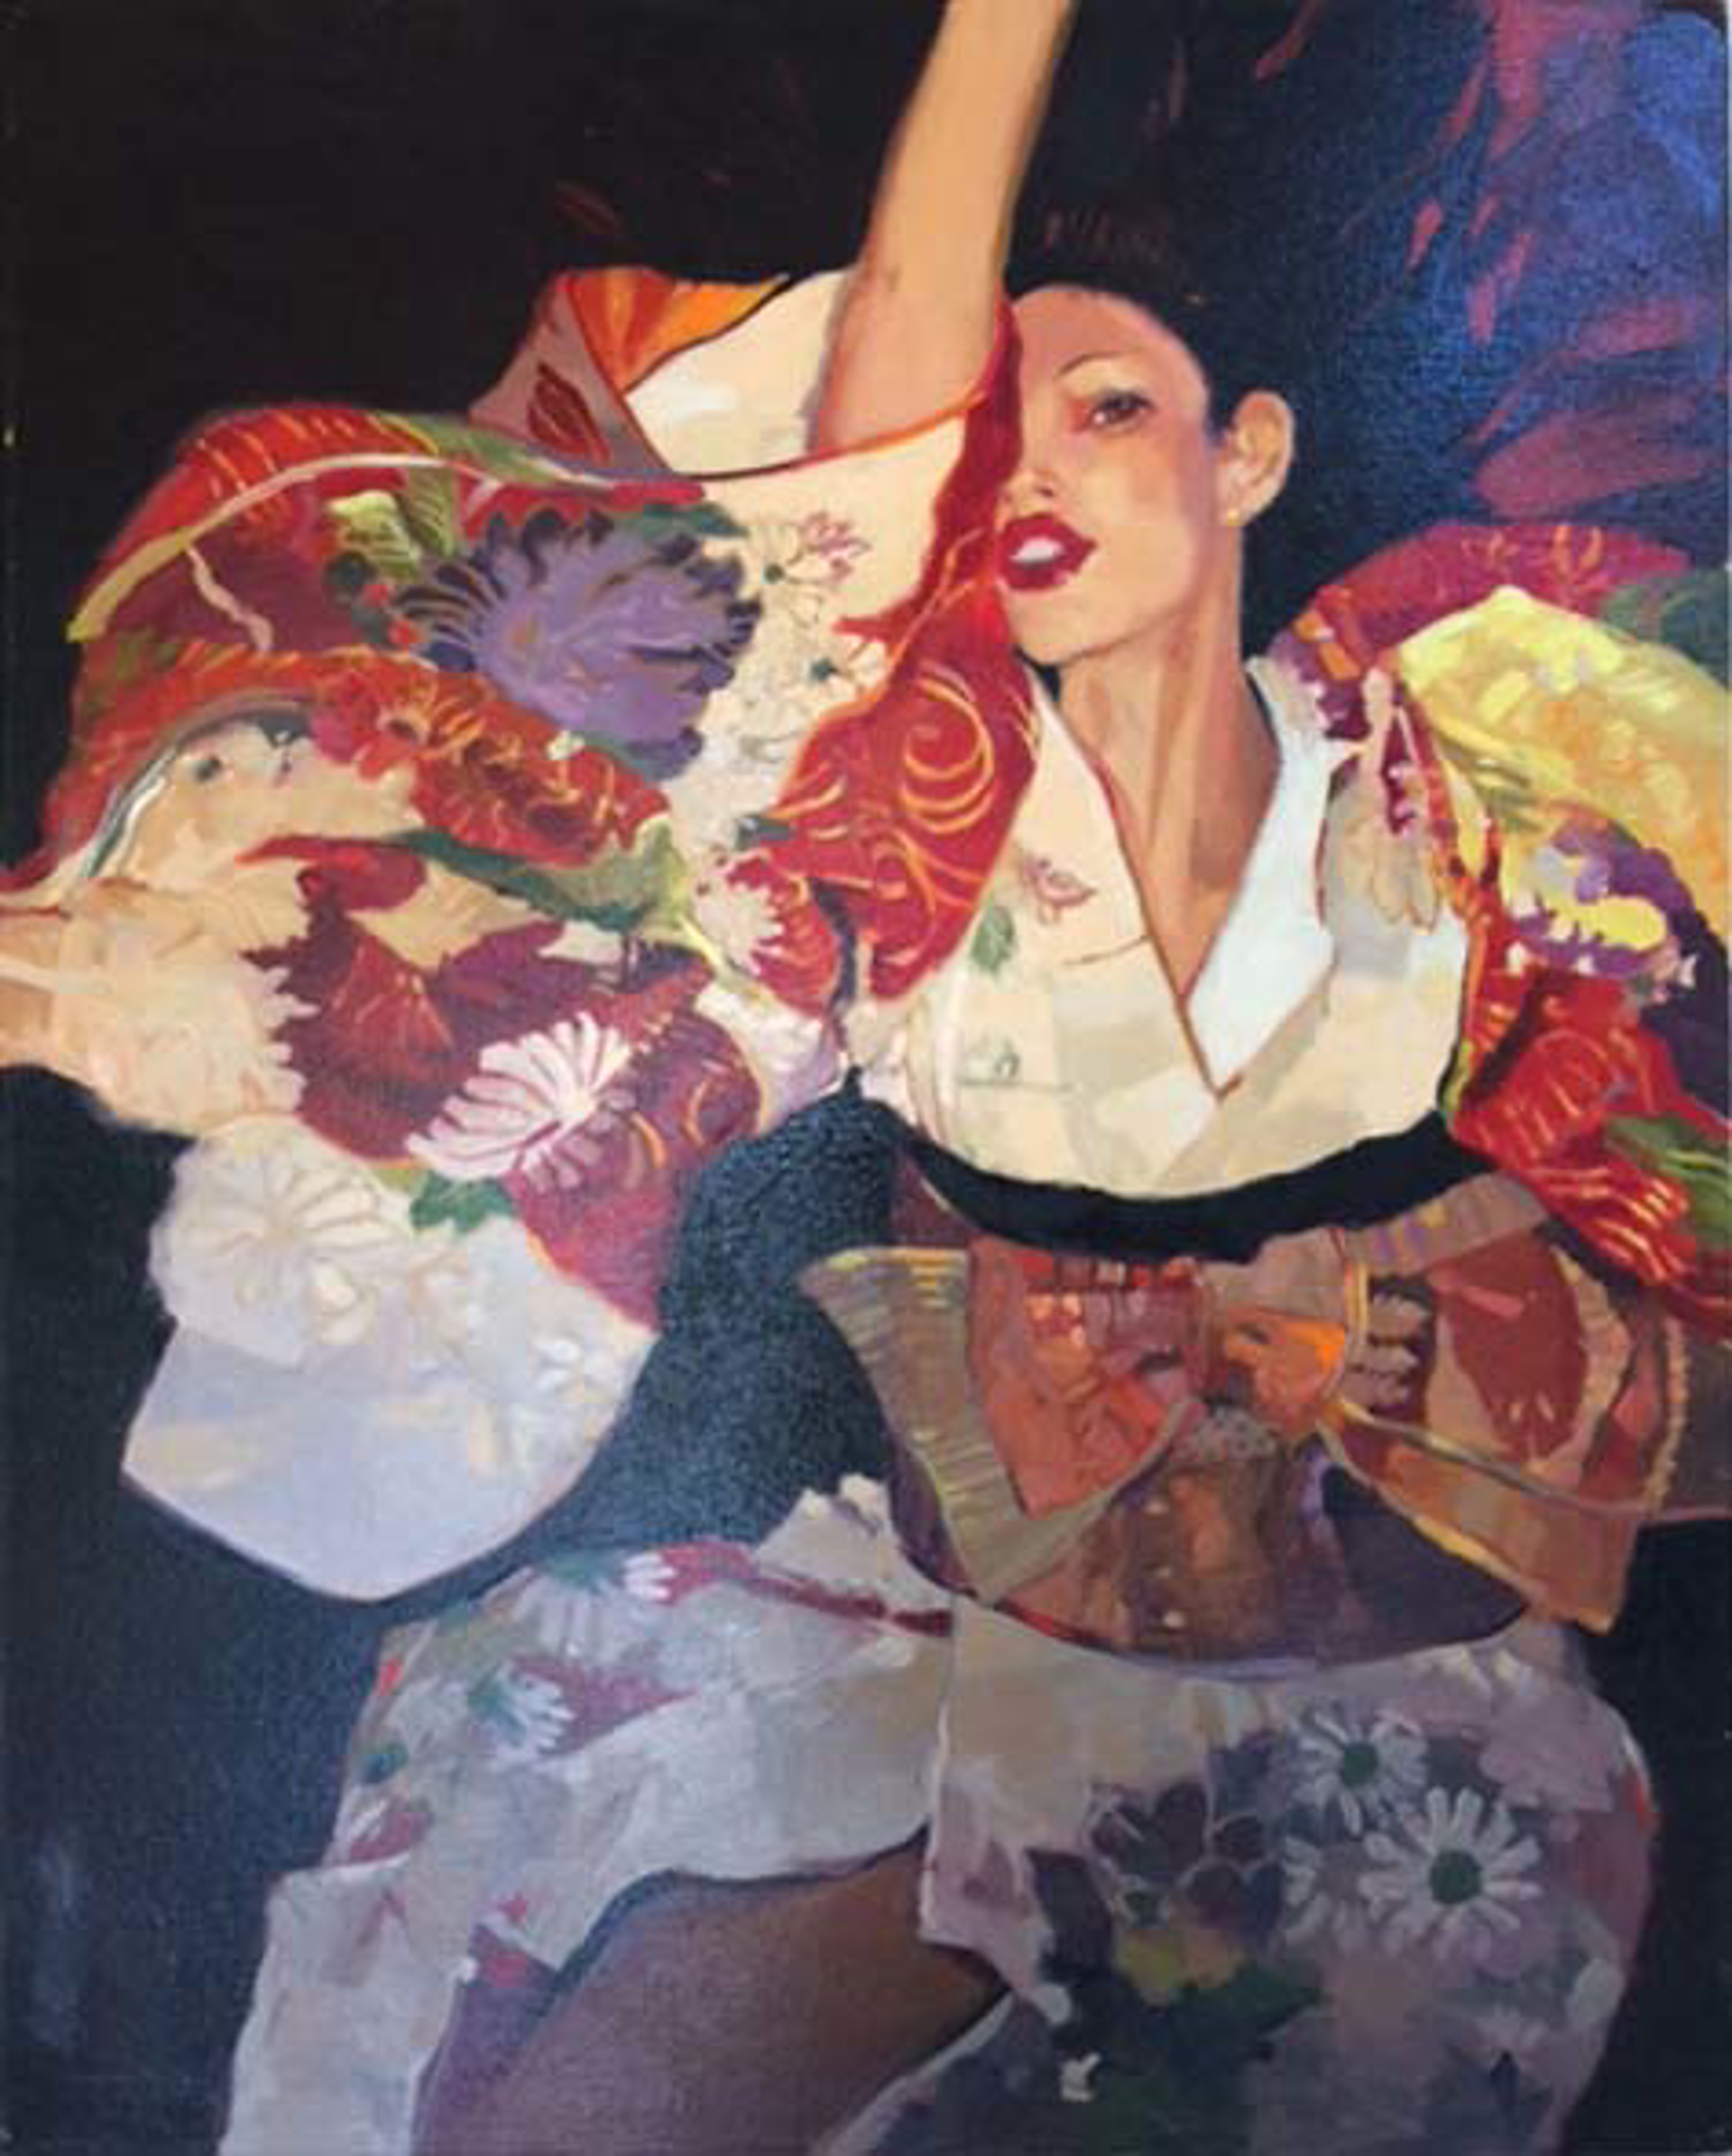 Kimono In The Wind by Darrell Hill